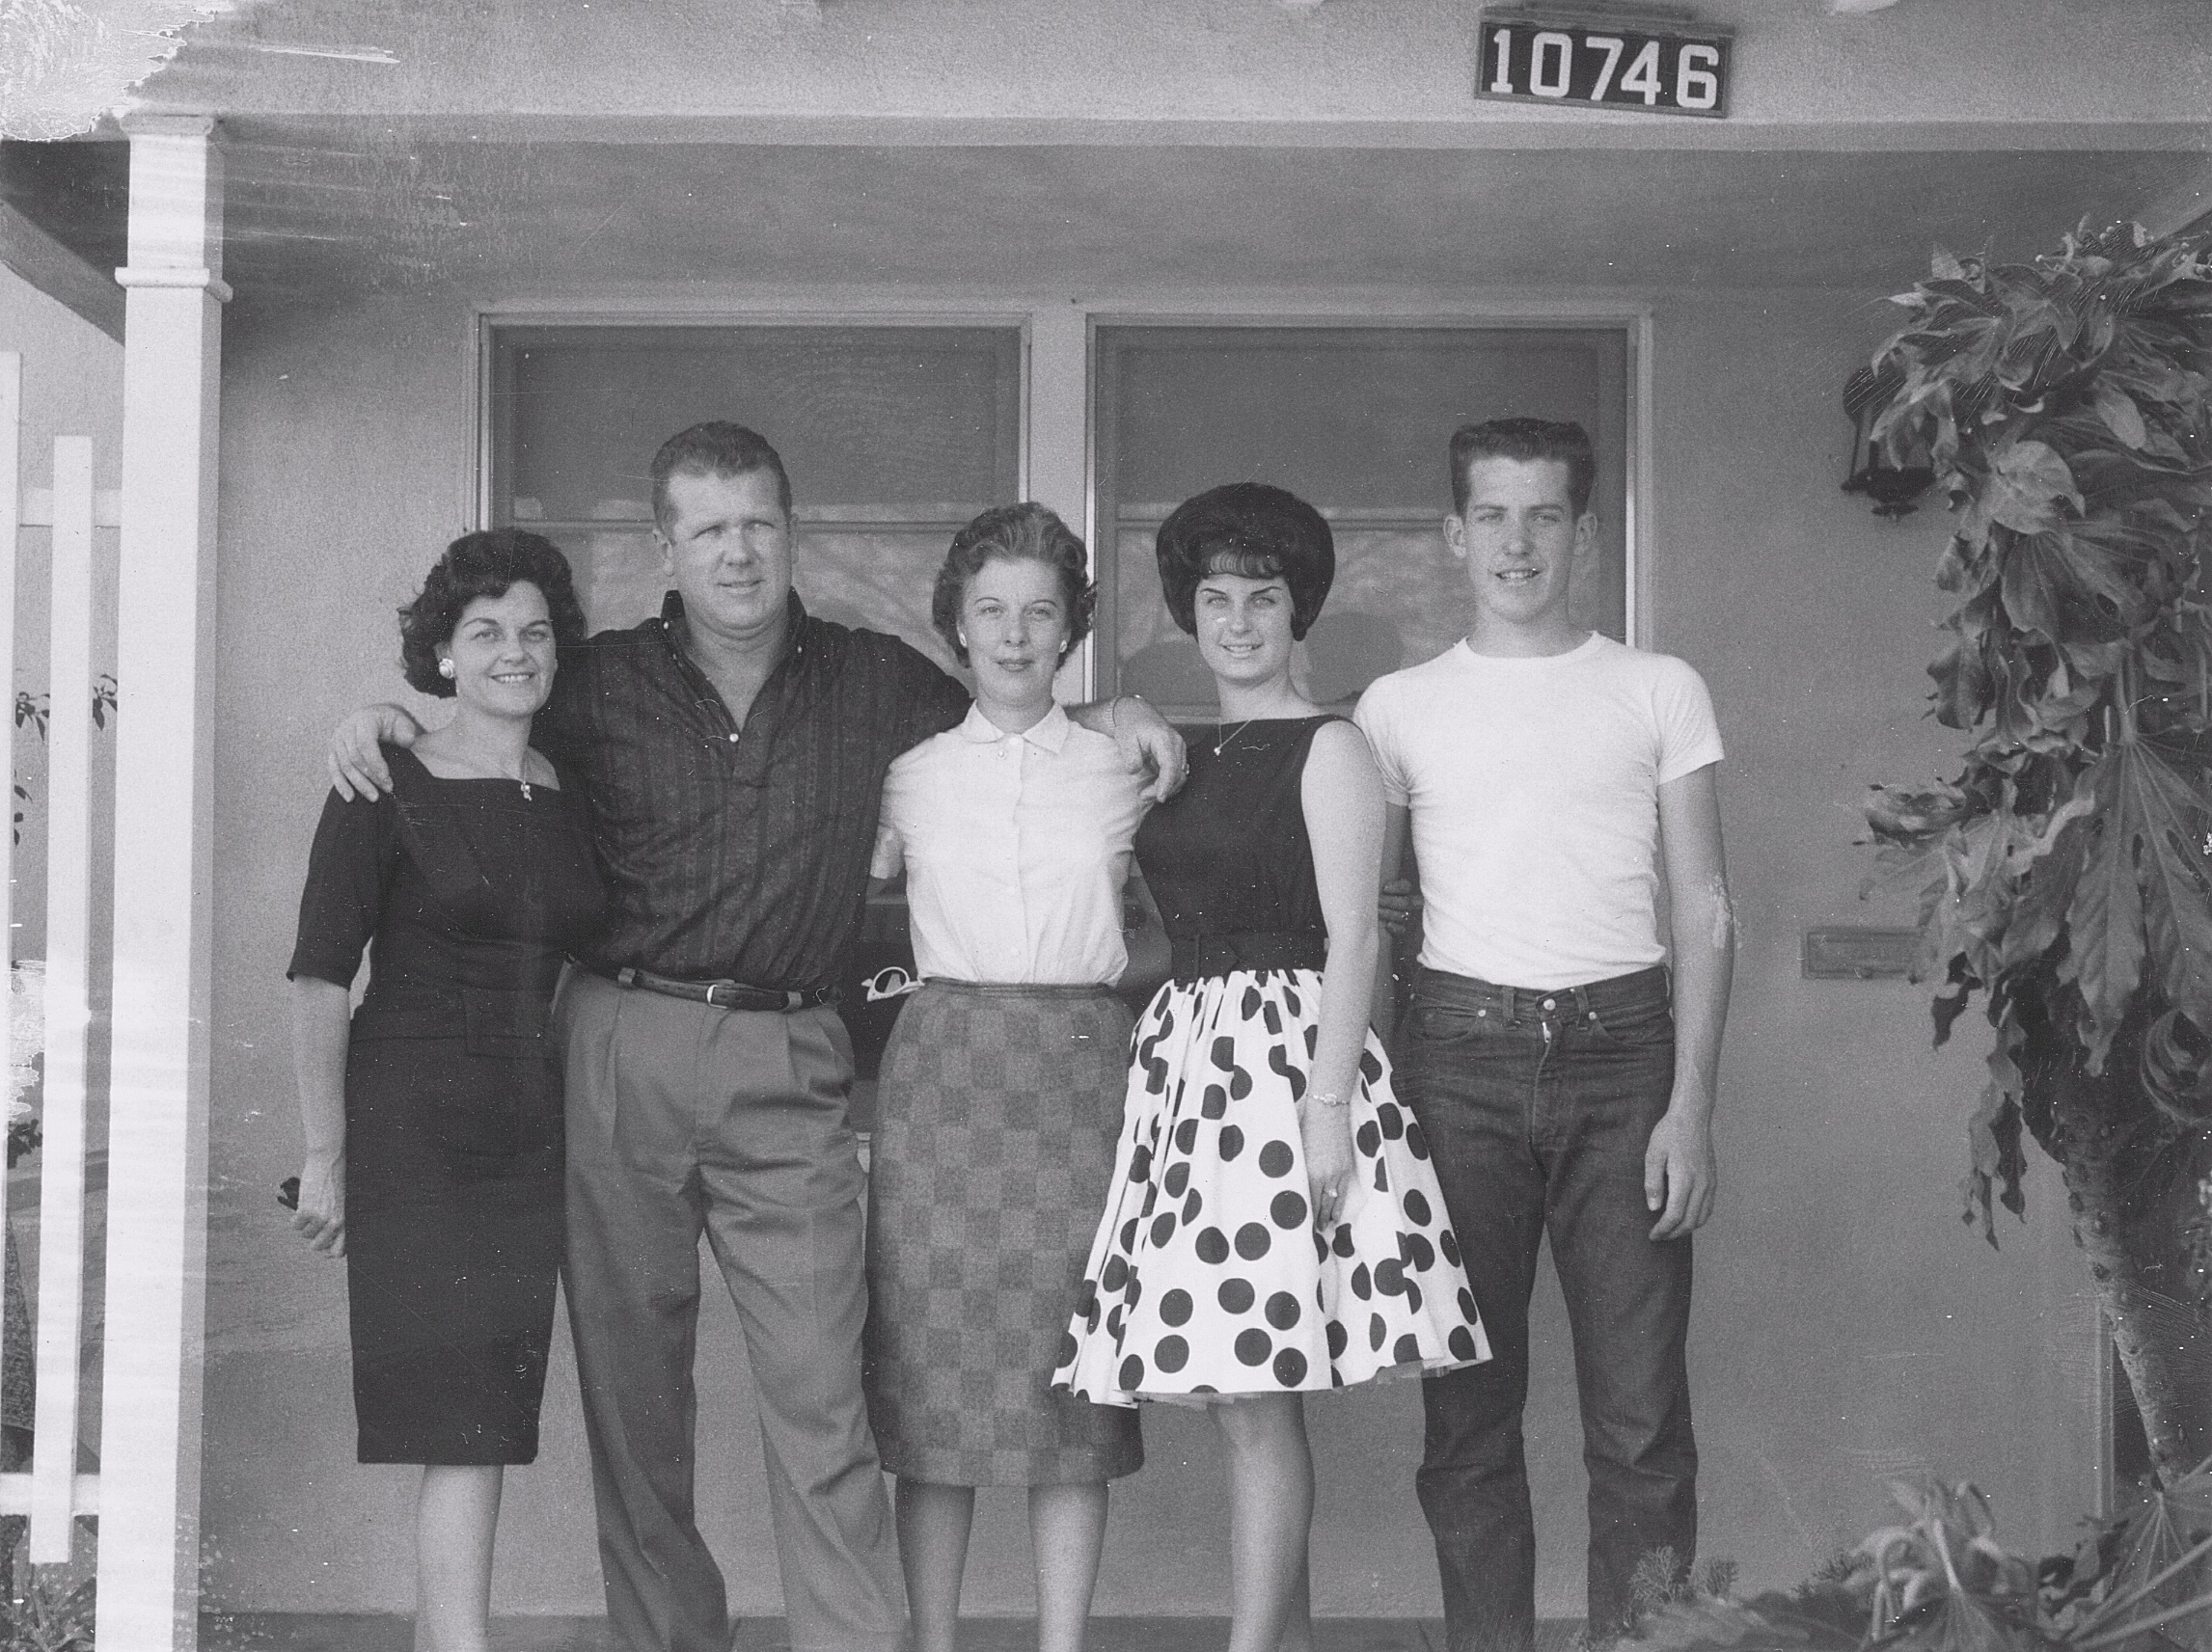 Bud and his family circa 1961- Kay, Bud, Bud's sister Jayne, daughter Marianne and son Bob.